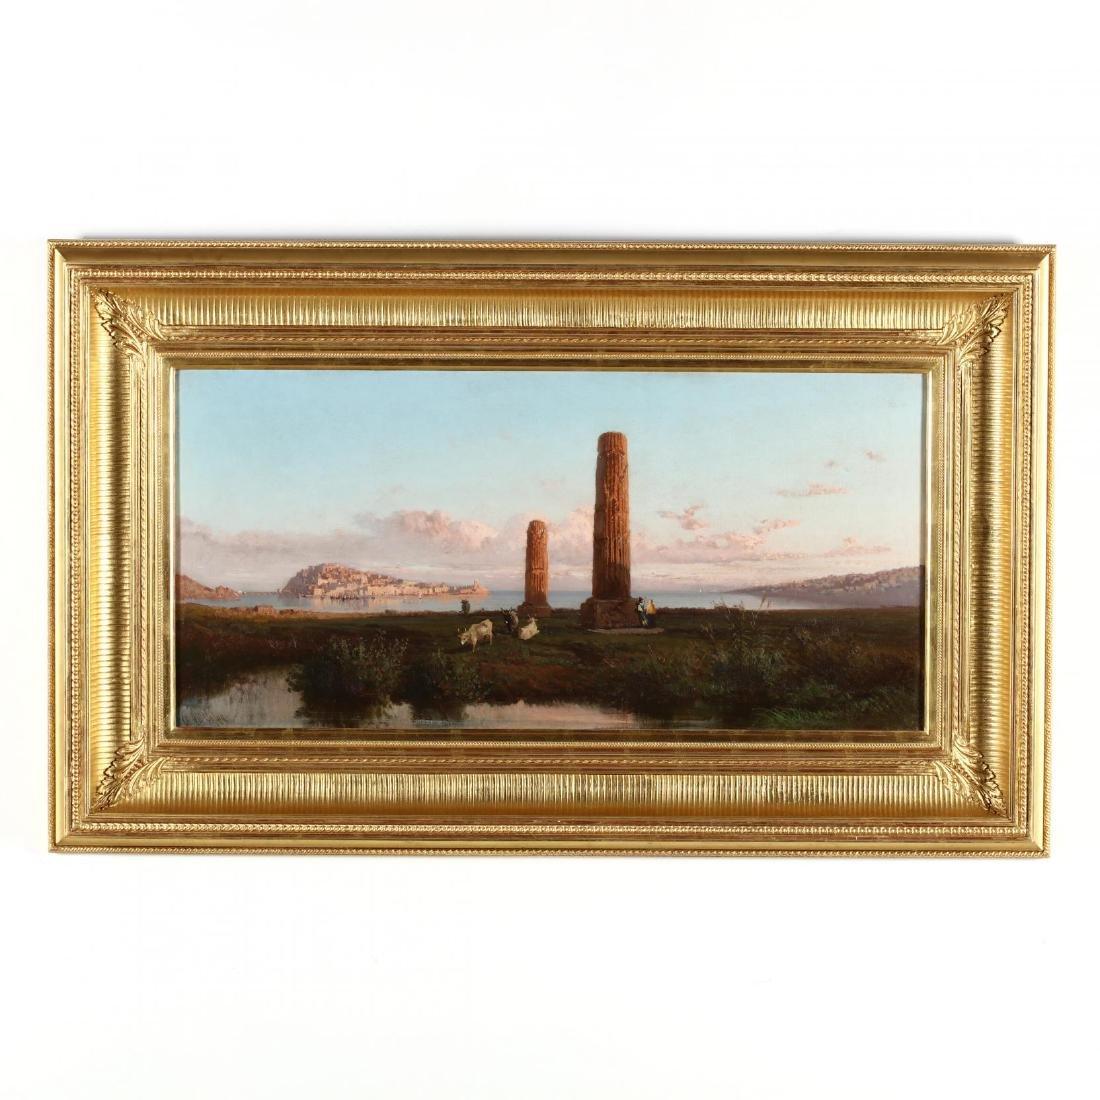 Alessandro La Volpe (Italian, 1820-1887), Coastline